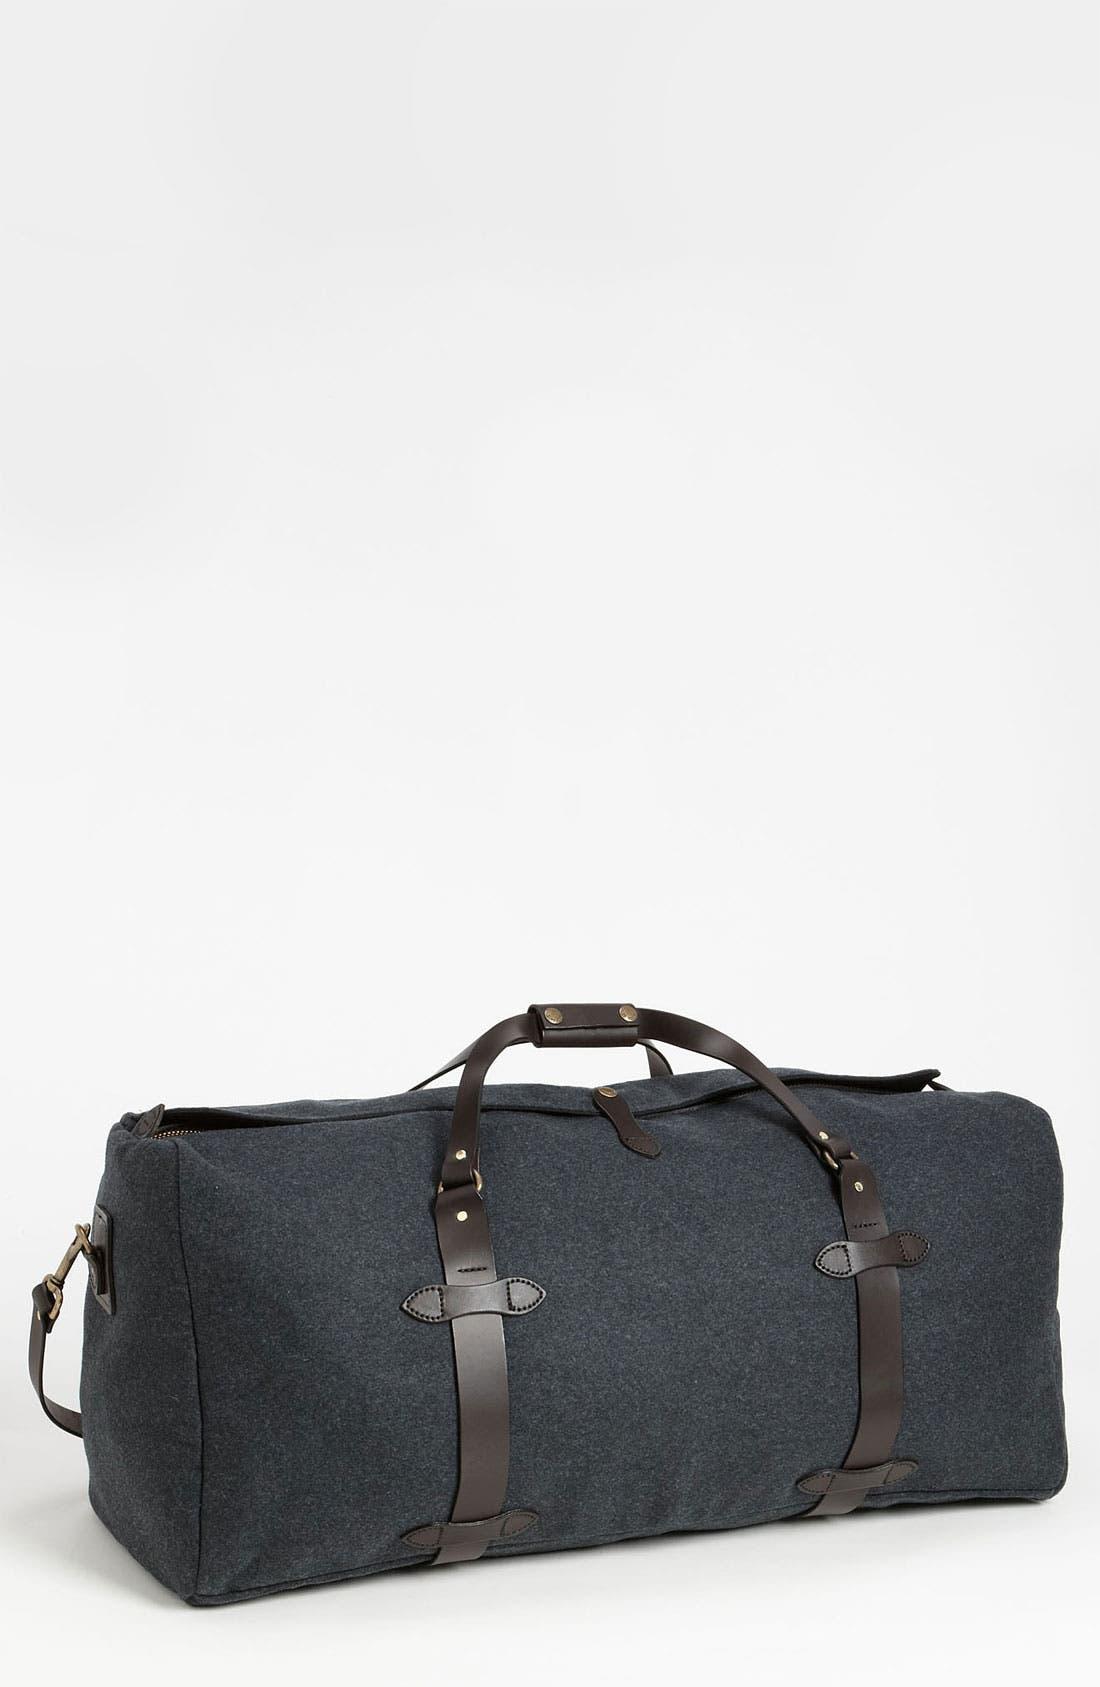 Large Wool Duffel Bag,                             Main thumbnail 1, color,                             Charcoal